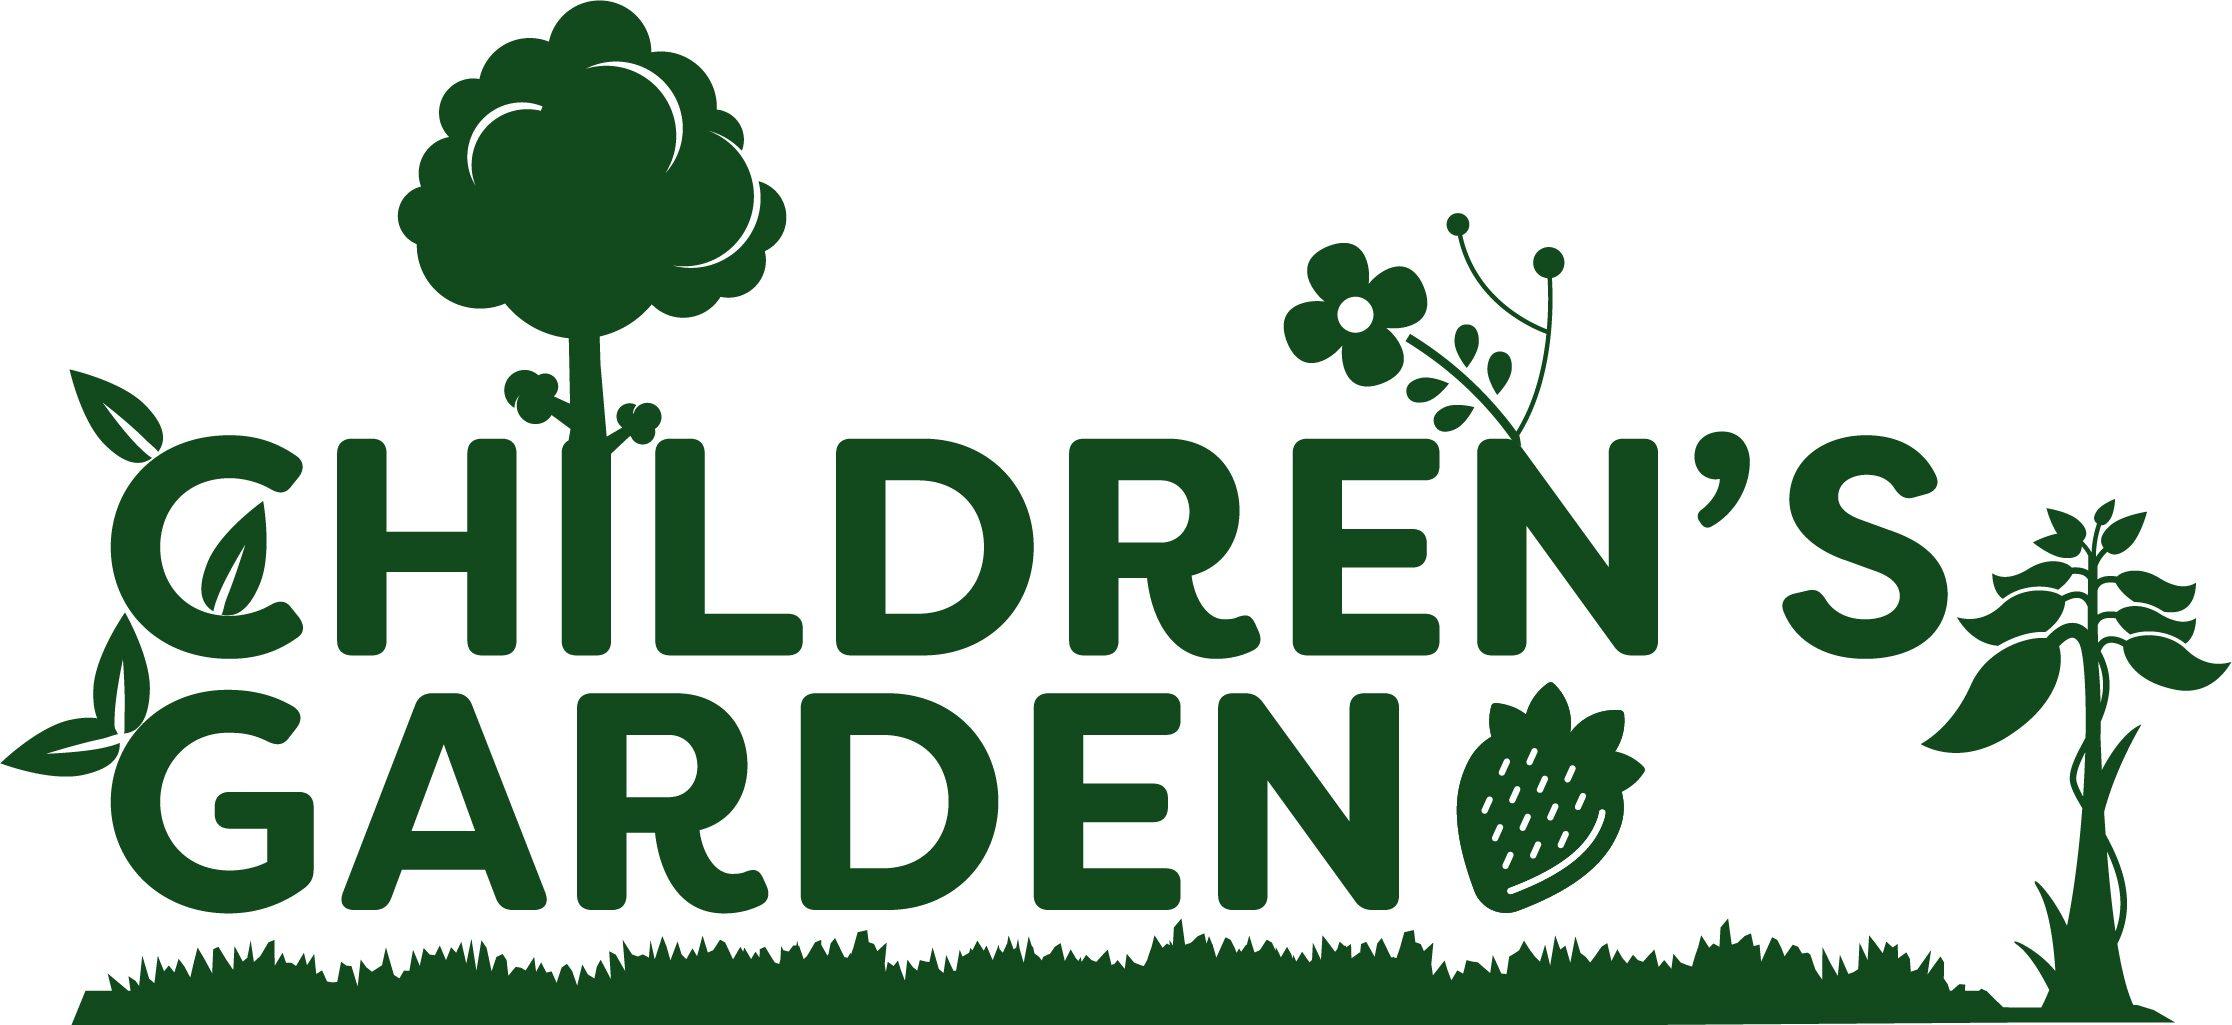 Home   Children's Garden Project – Hamilton